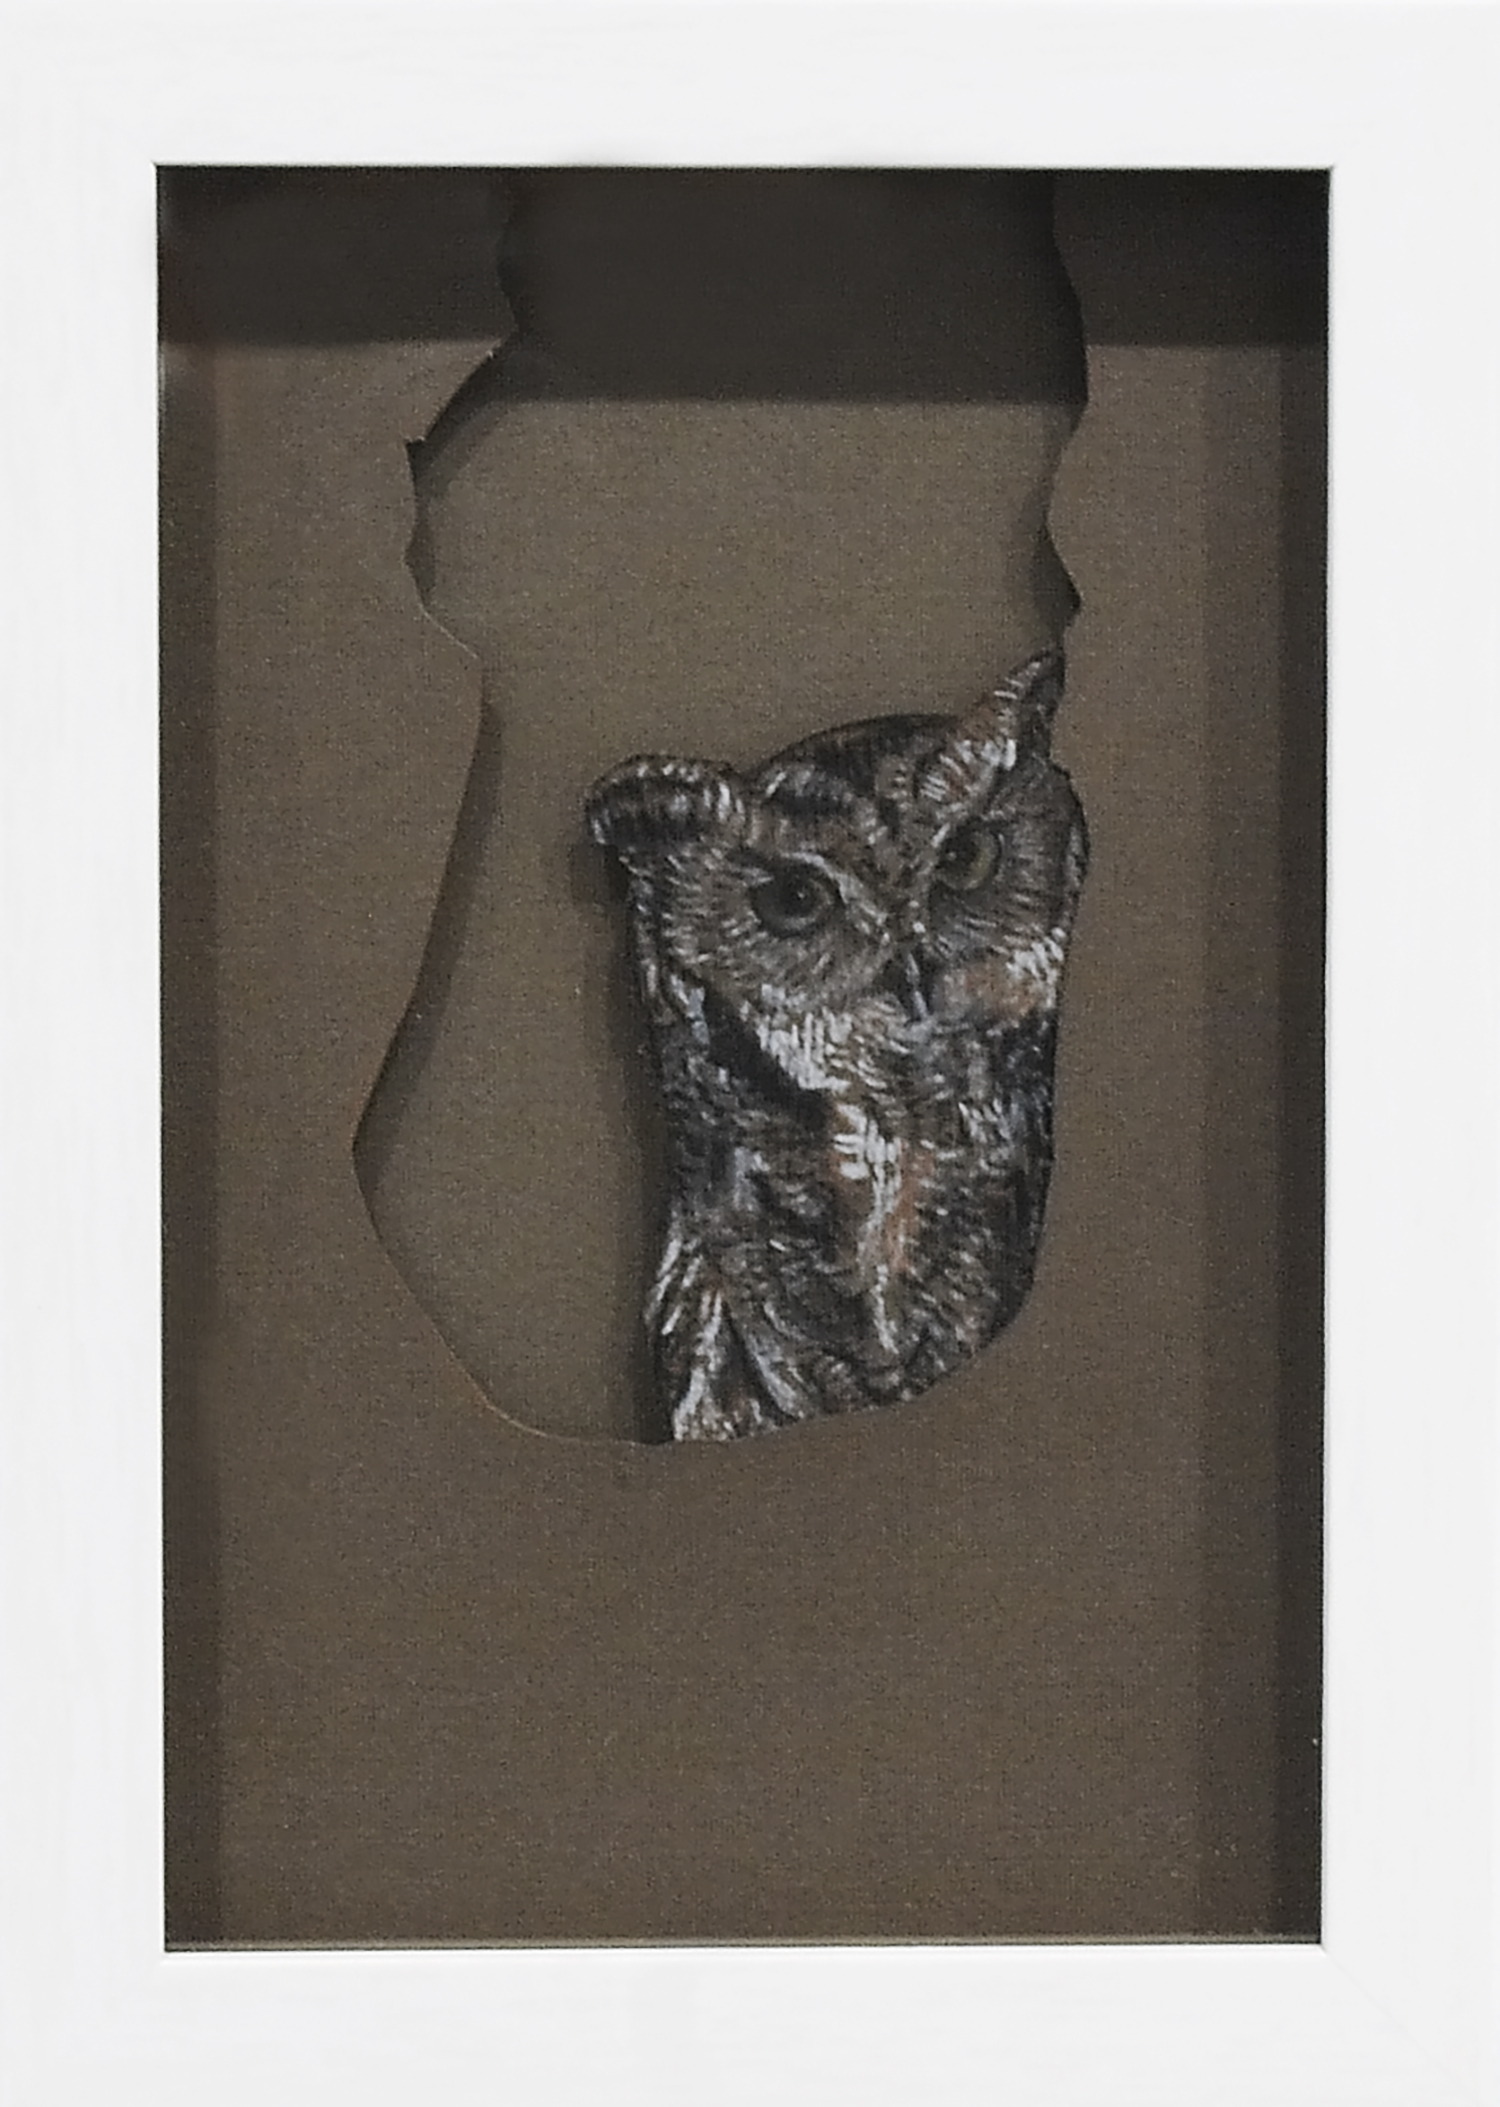 Owl, 2008, Pastel on Card, 17.1 x 24.2 x 3.8 cm